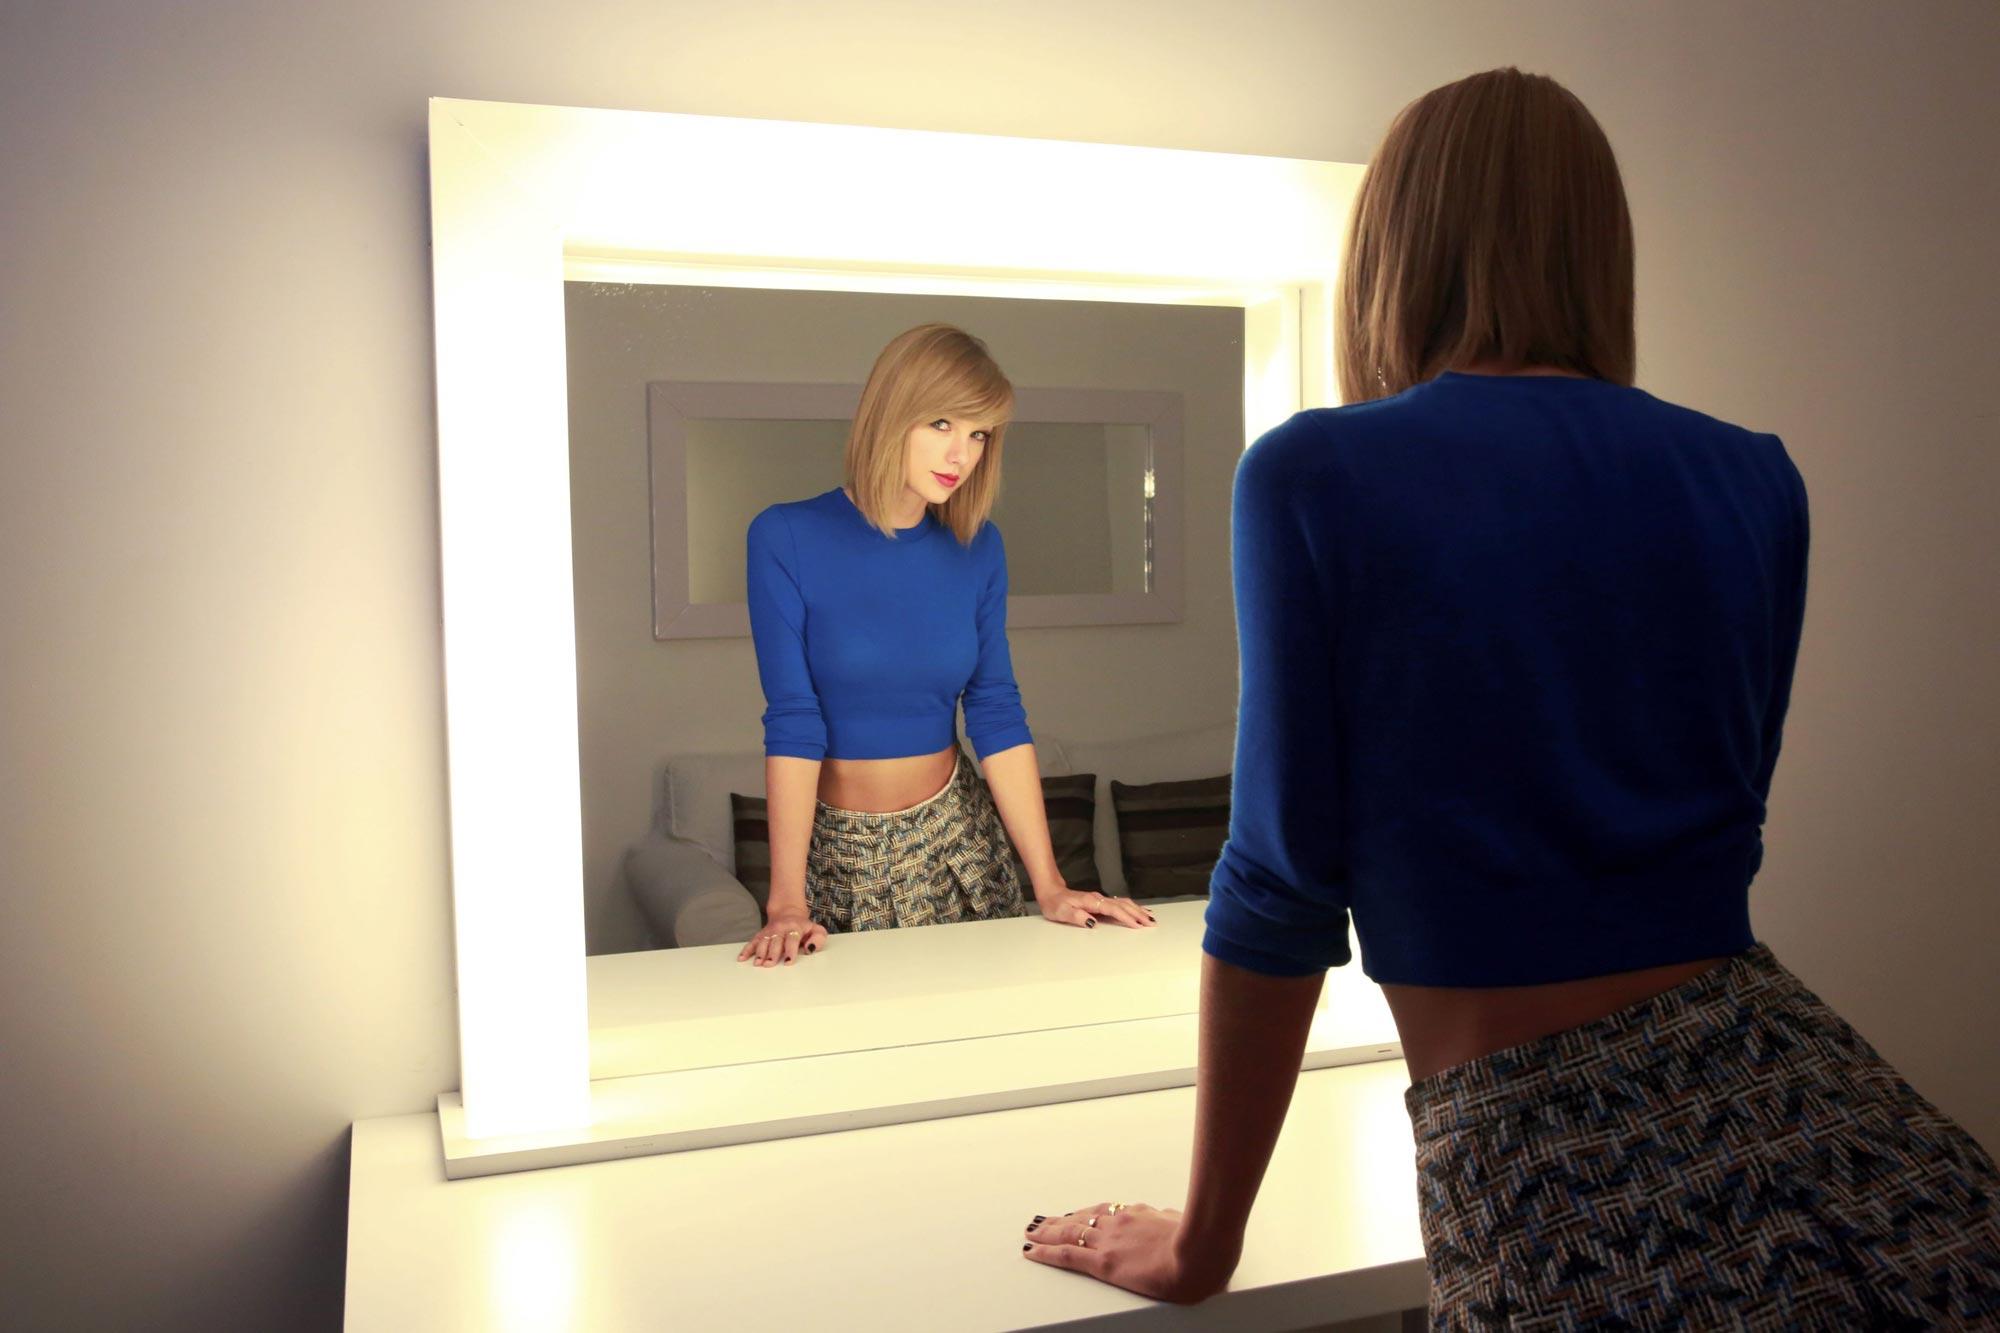 Taylor Swift oc 03